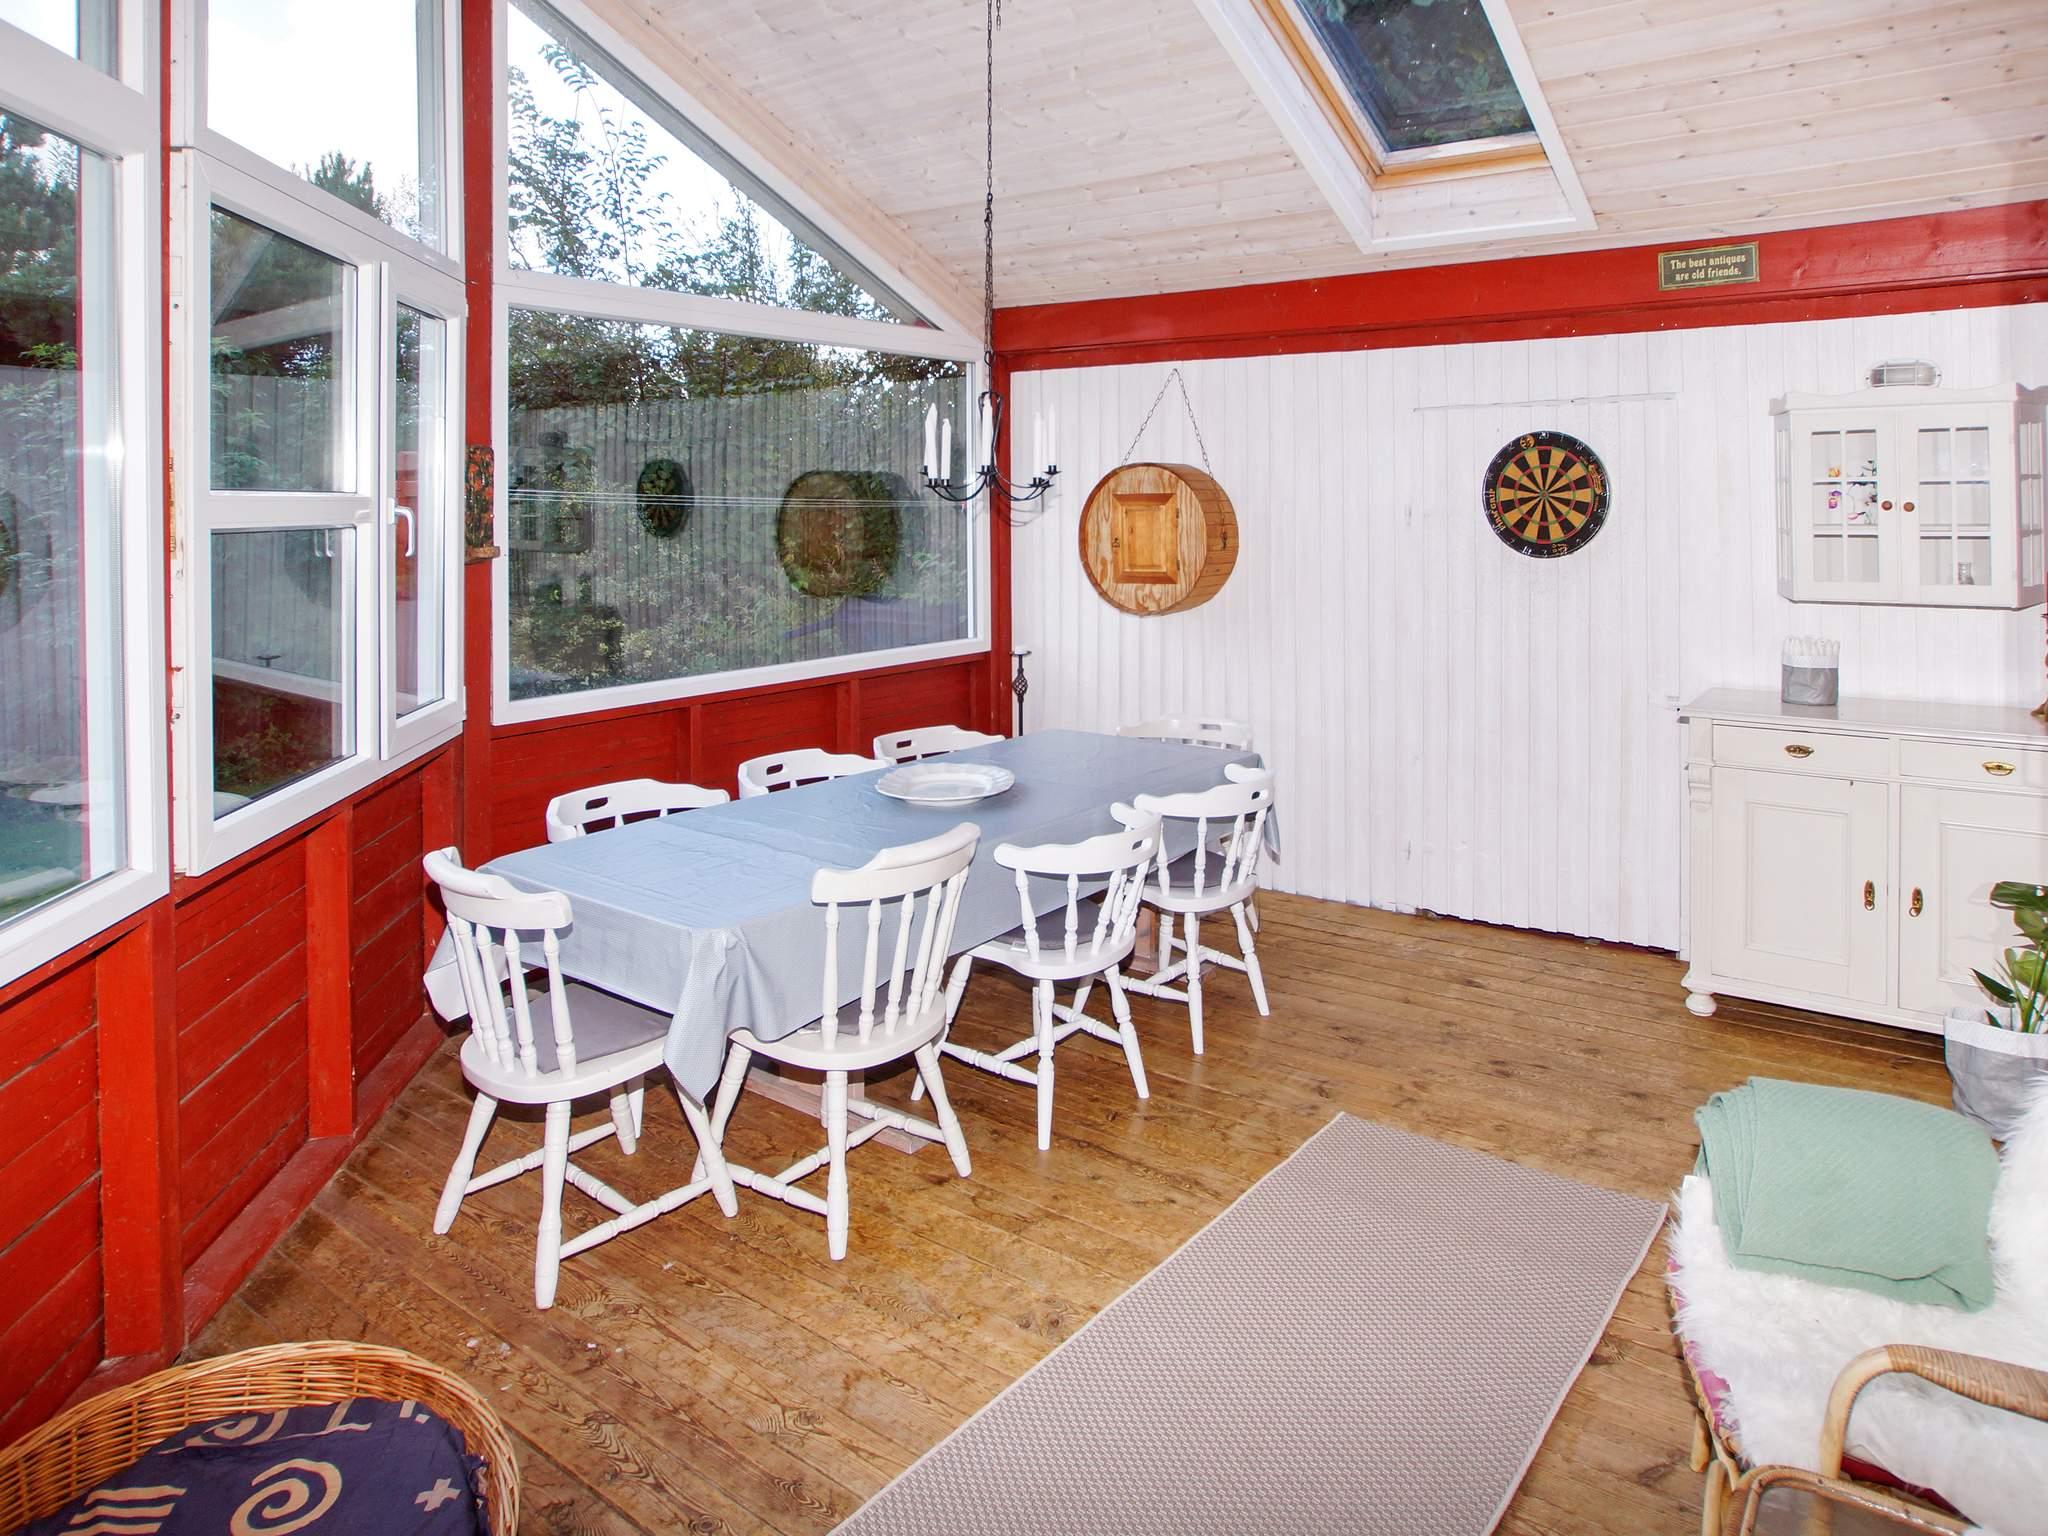 Ferienhaus Skaven Strand (493385), Tarm, , Westjütland, Dänemark, Bild 5